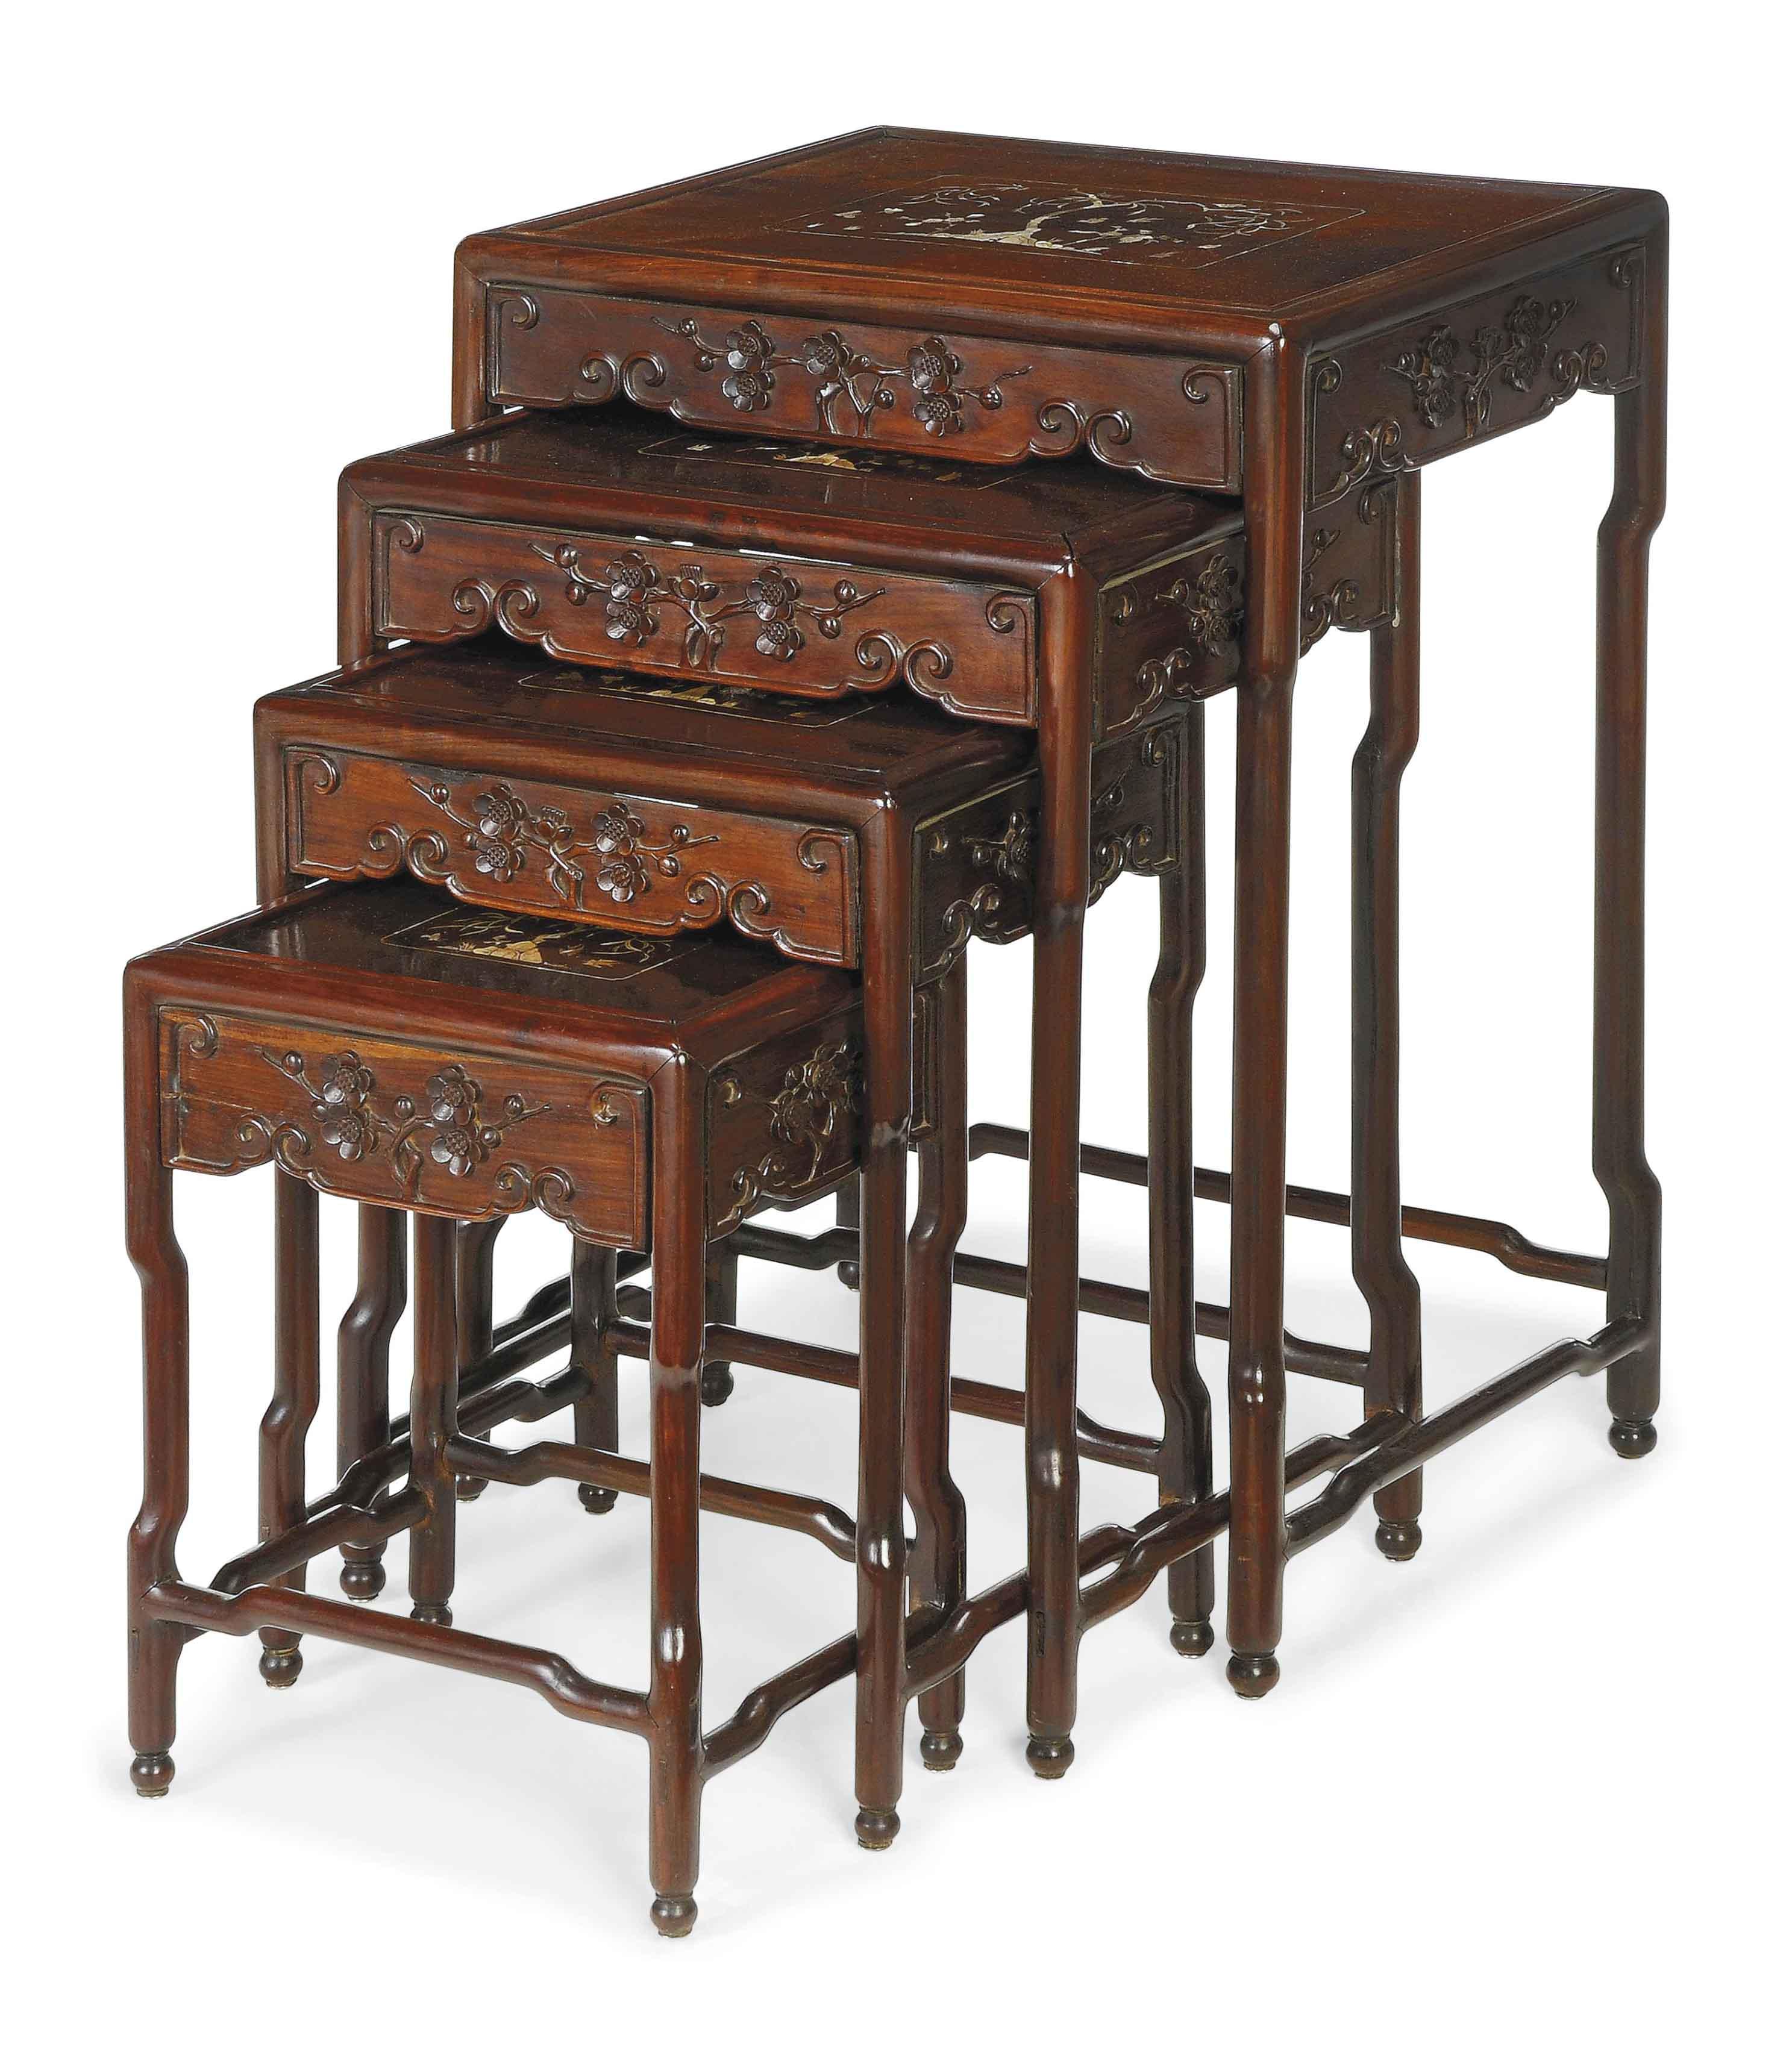 Pearl Inlaid Hardwood Quartetto Tables